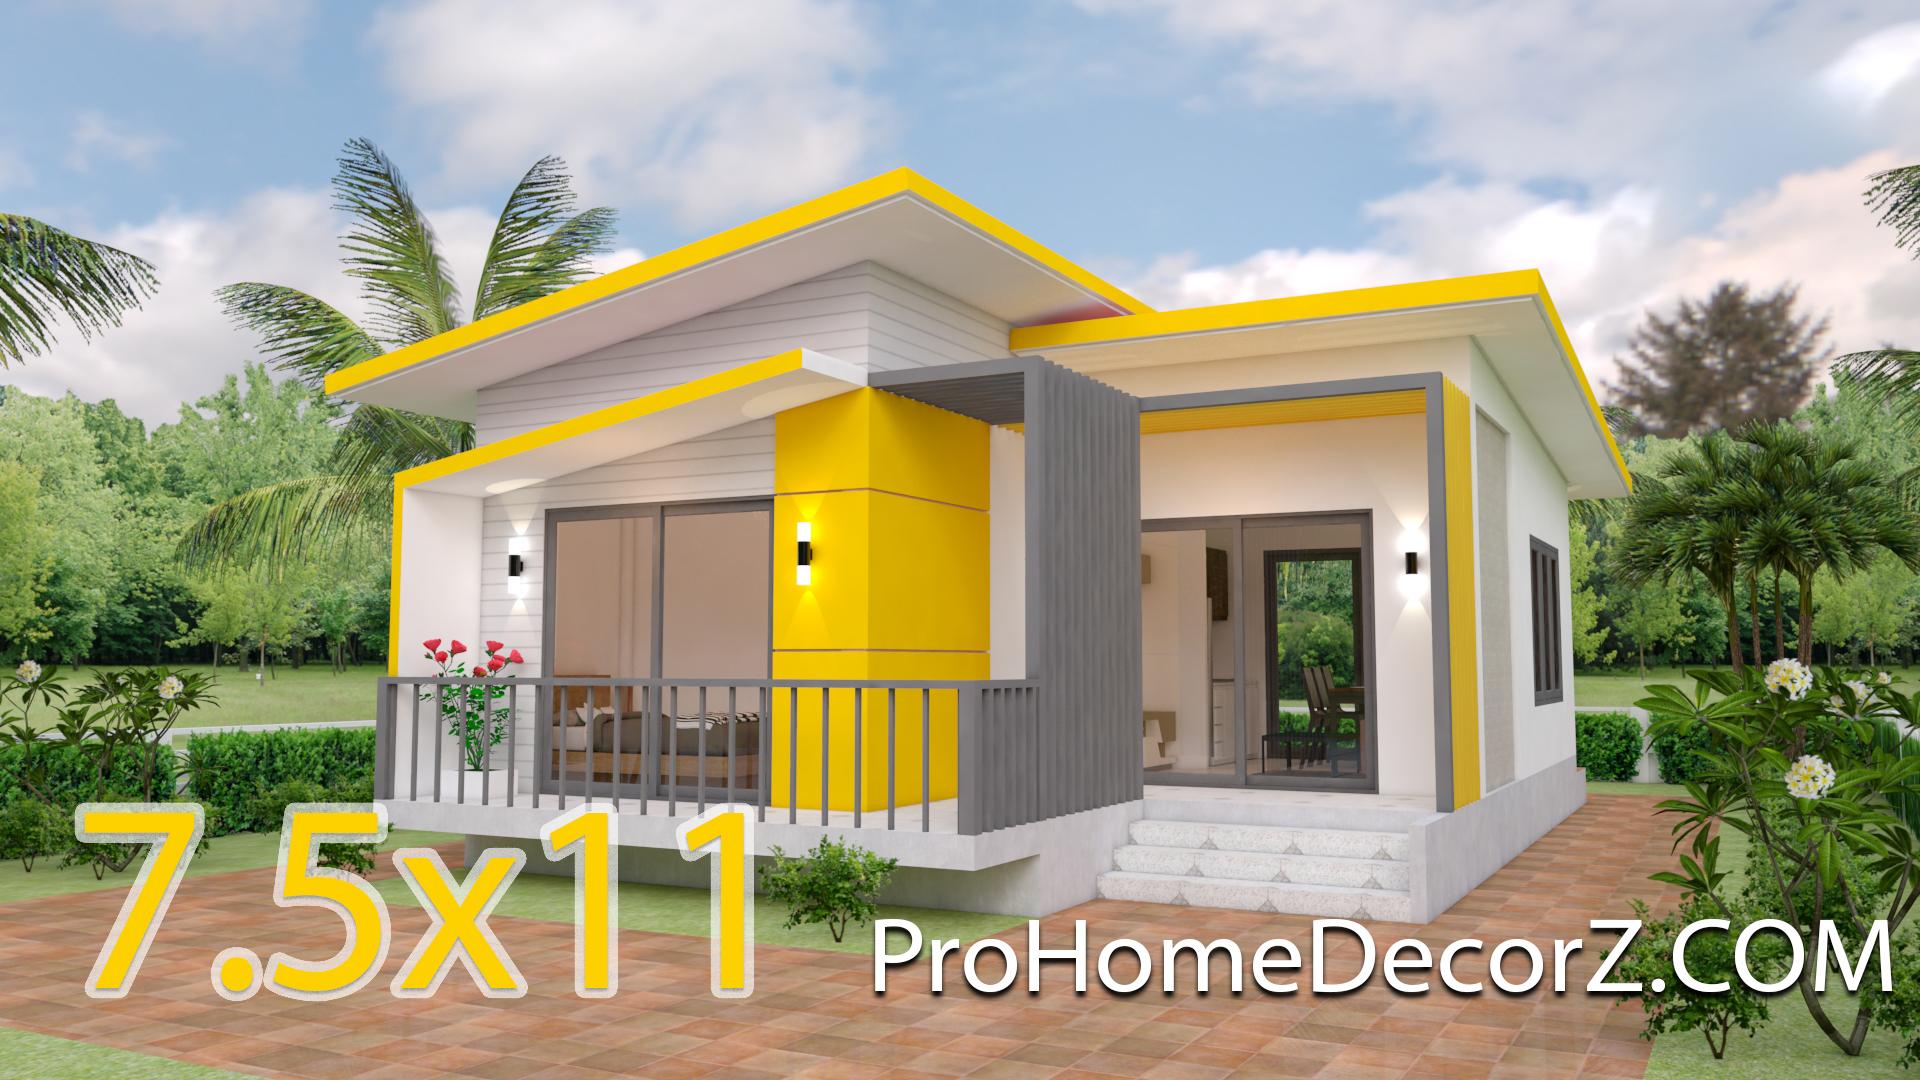 Small Modern House Design 32.32x32 Meter 232x32 Feet   Pro Home DecorS